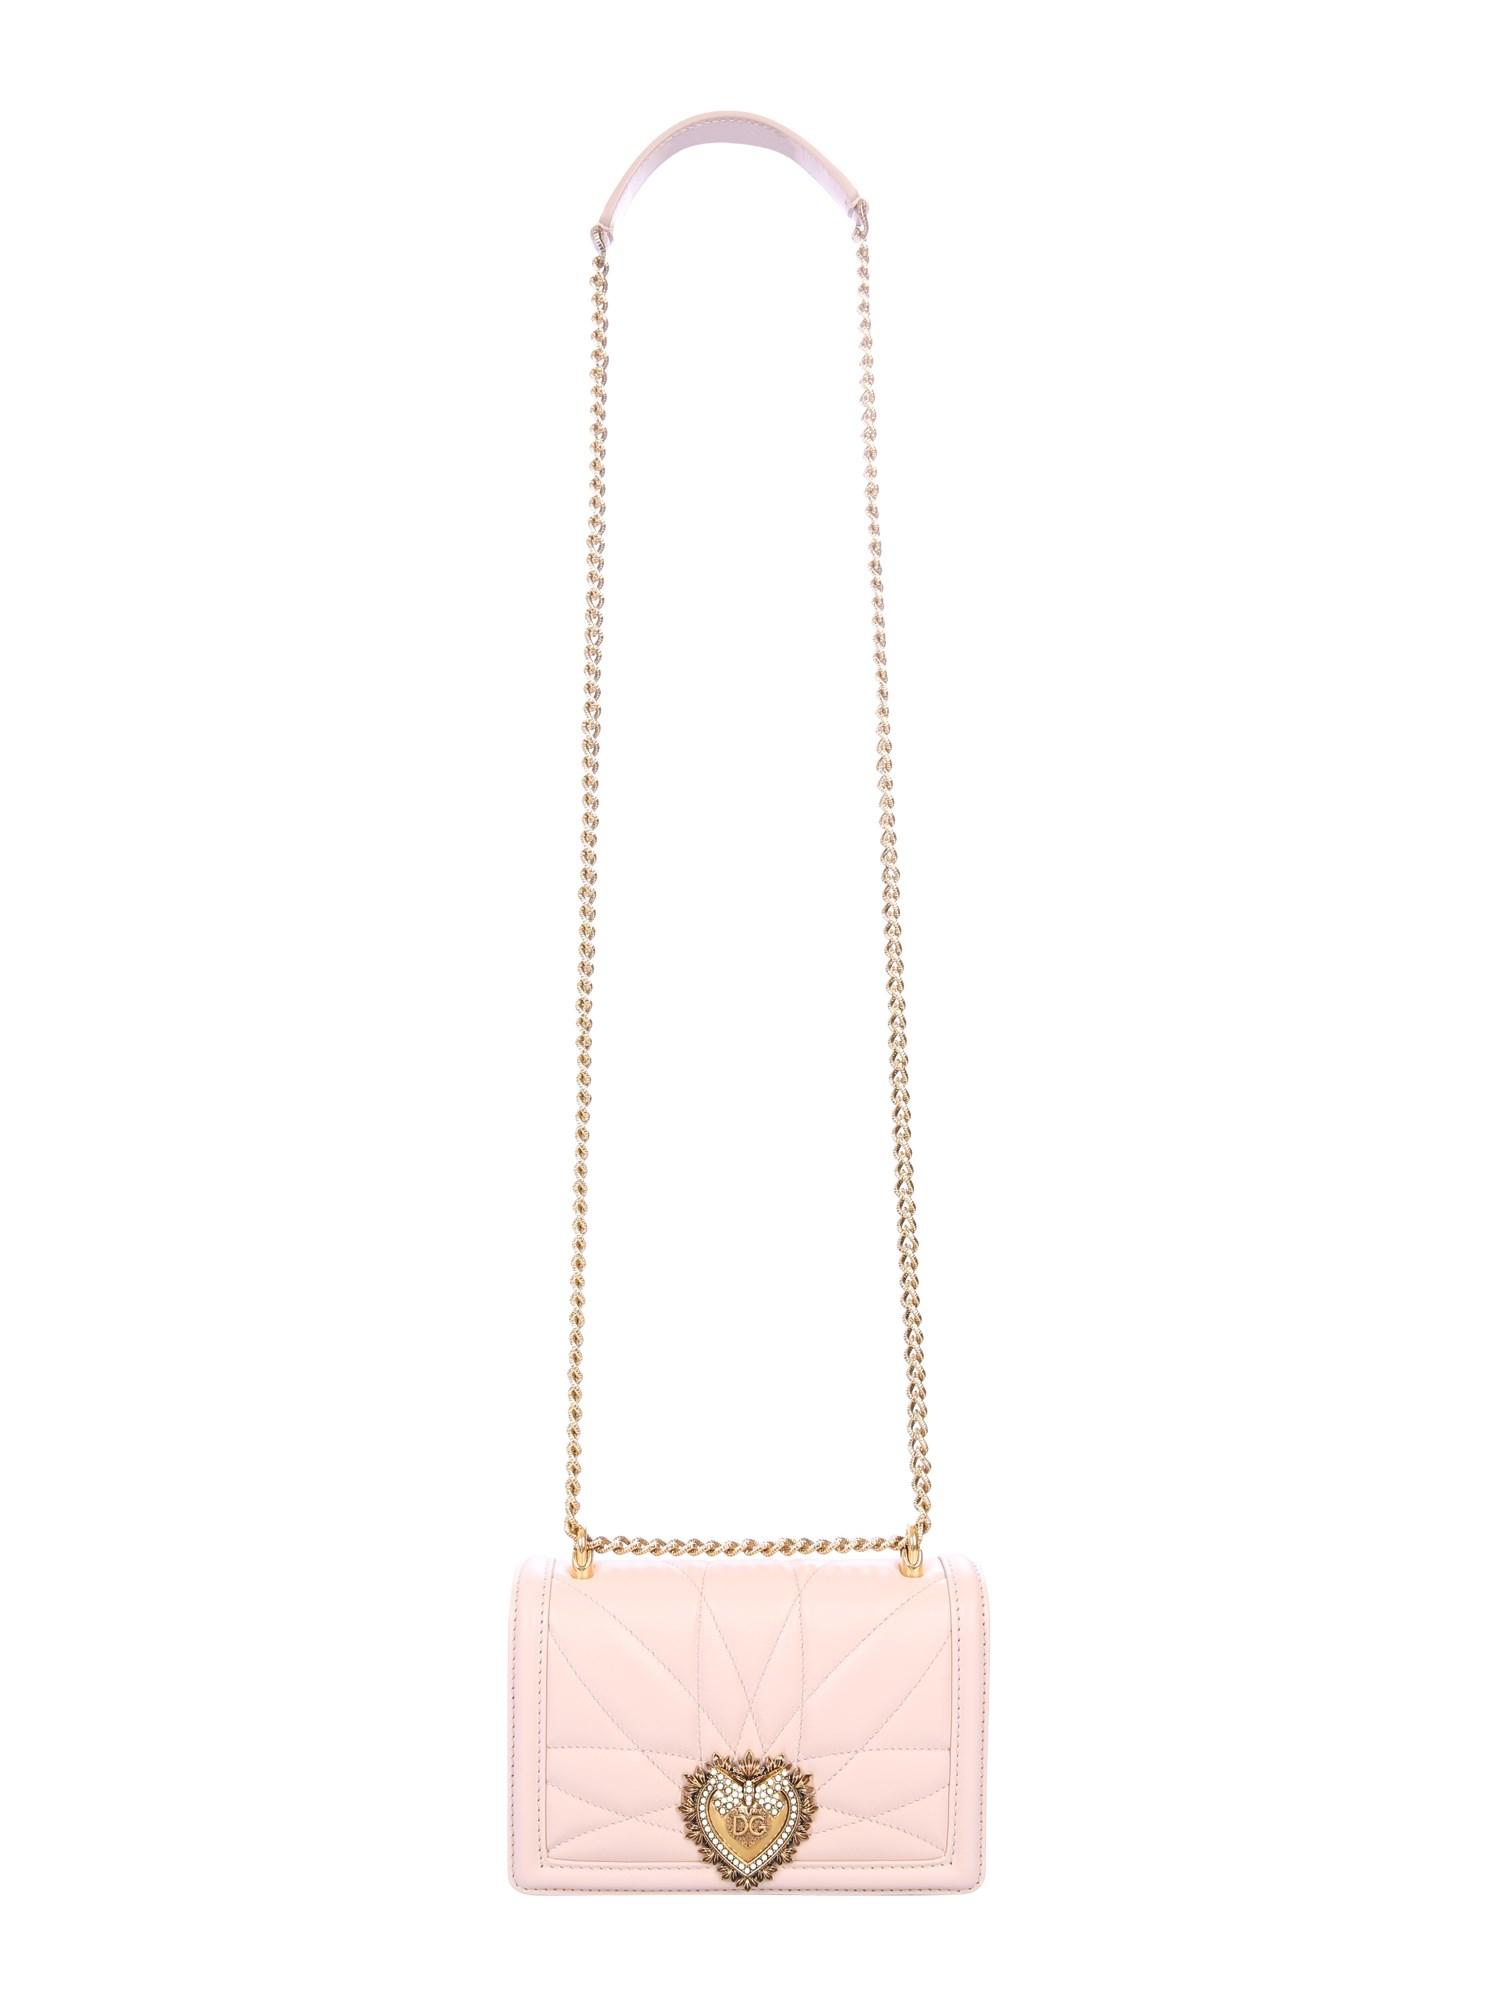 Dolce & Gabbana Bags MINI DEVOTION BAG